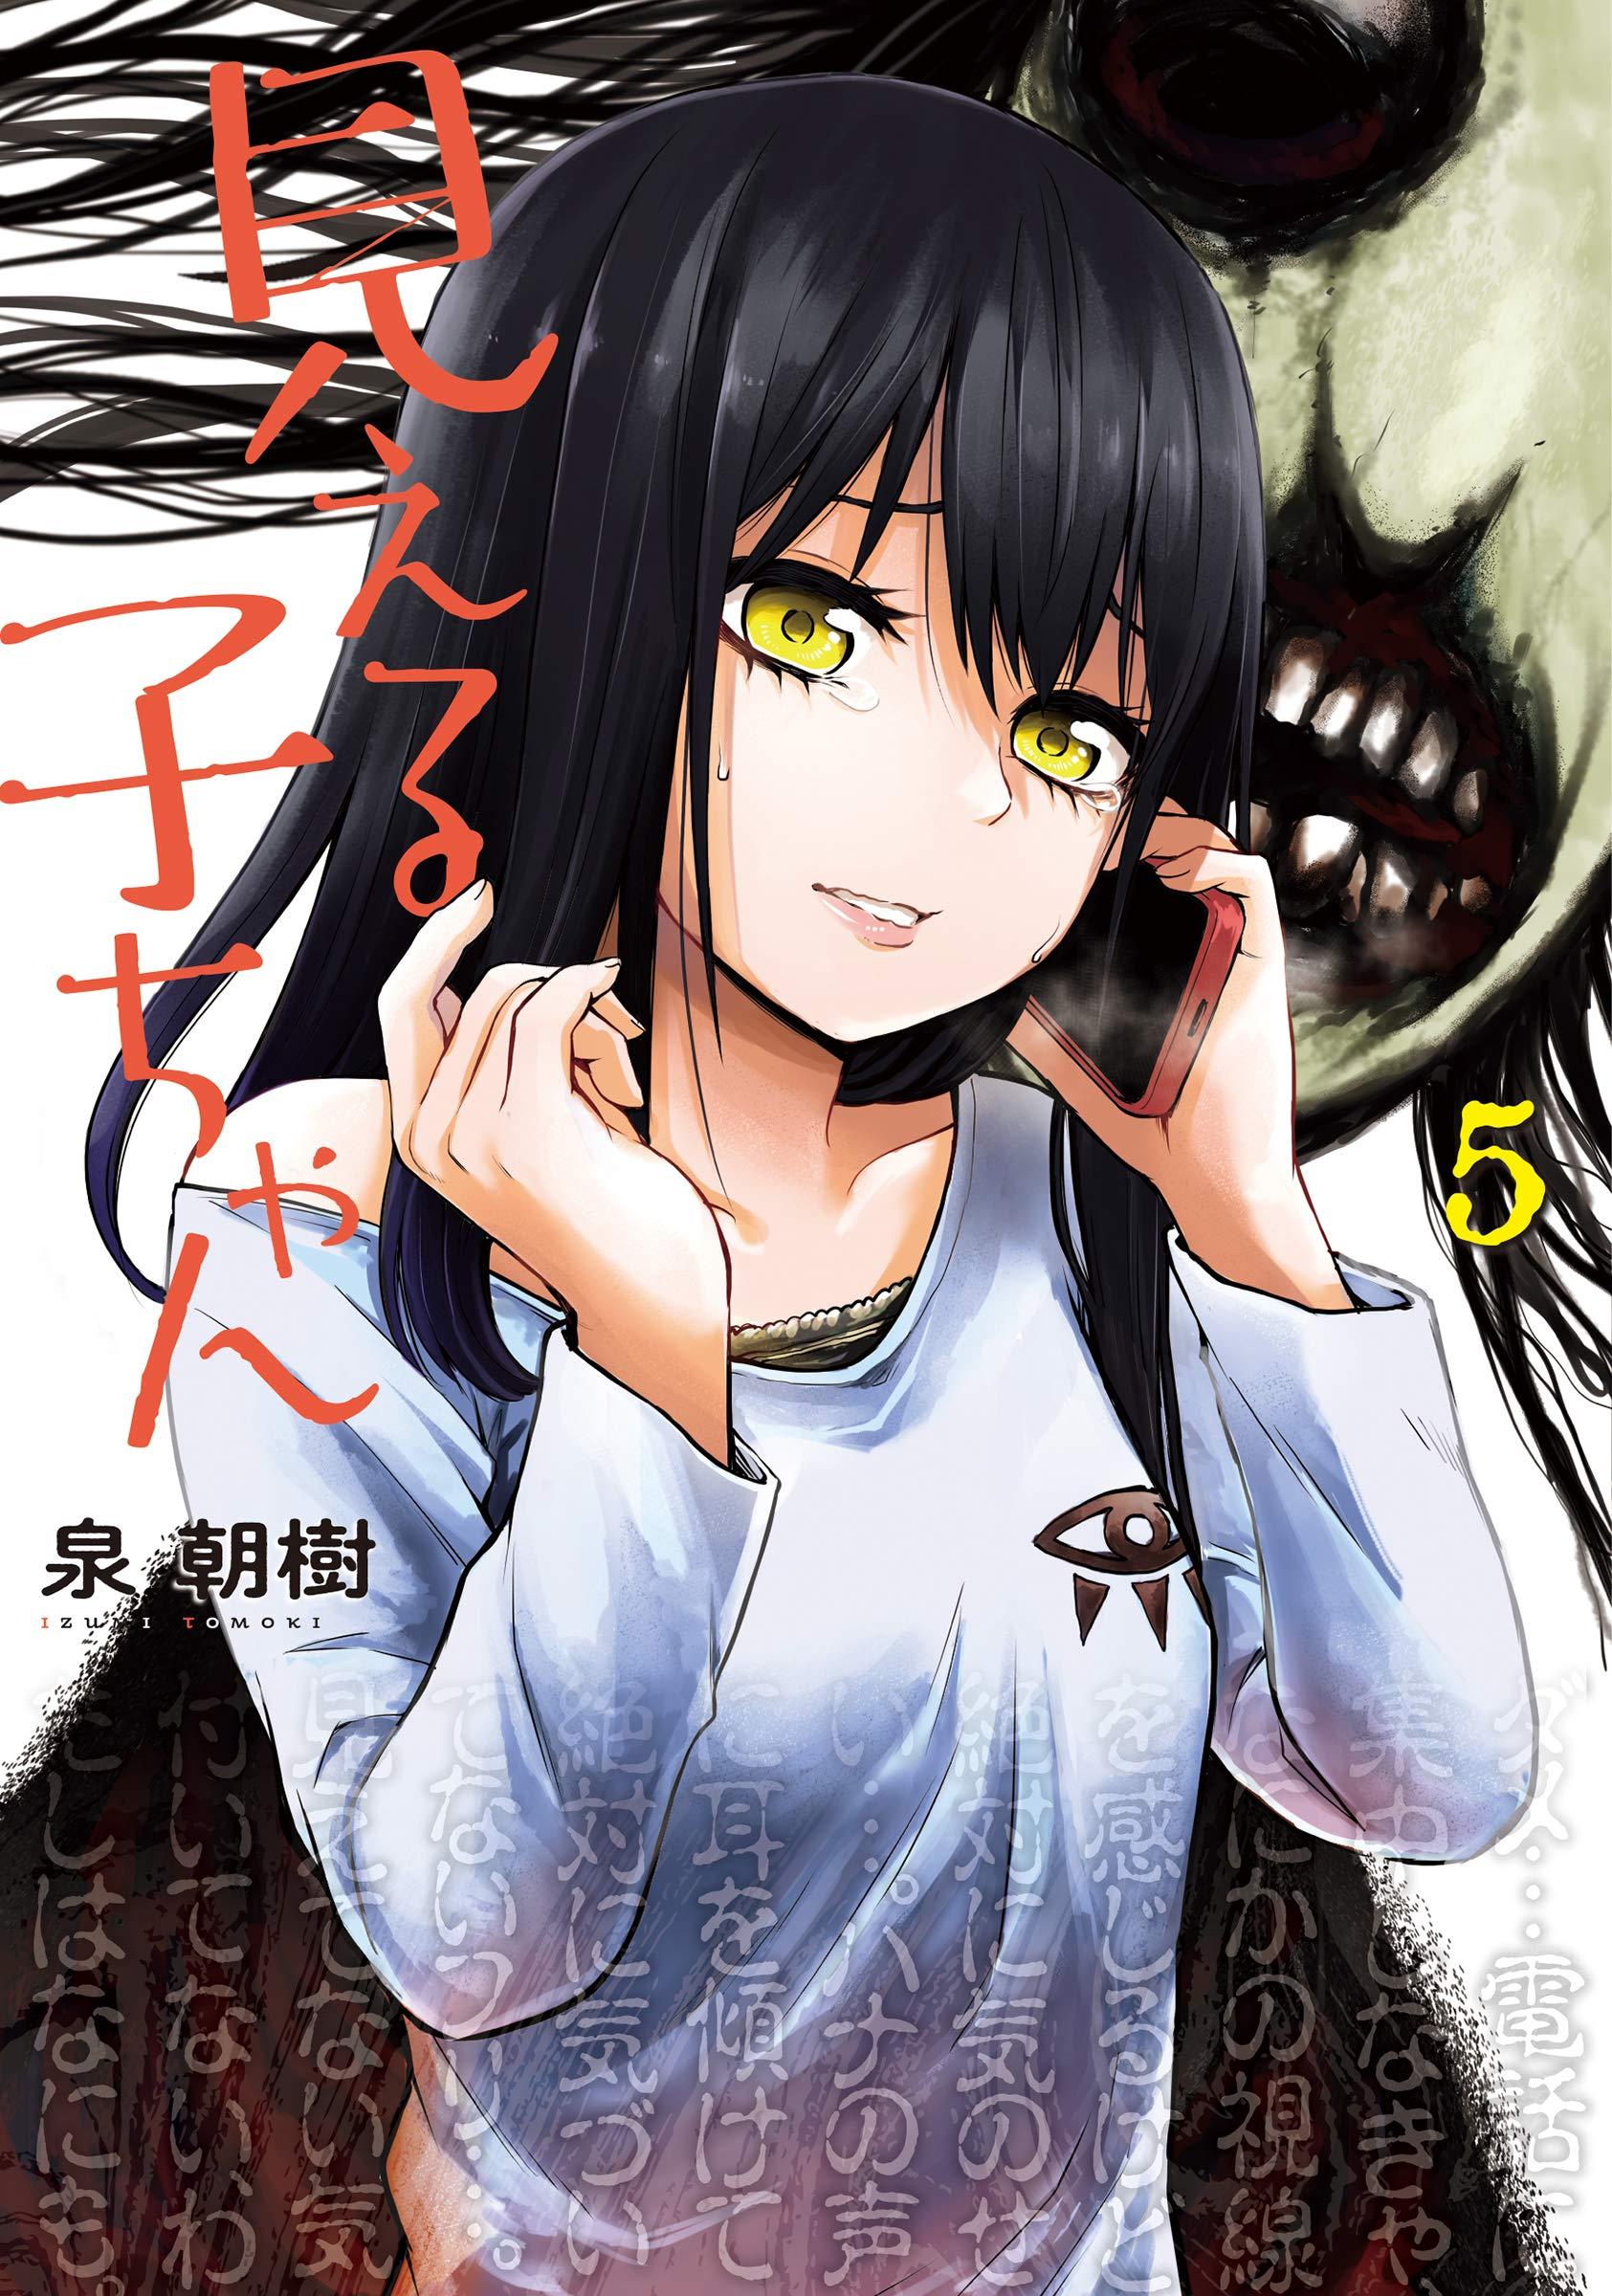 Mieruko-Chan : Slice of Horror 5